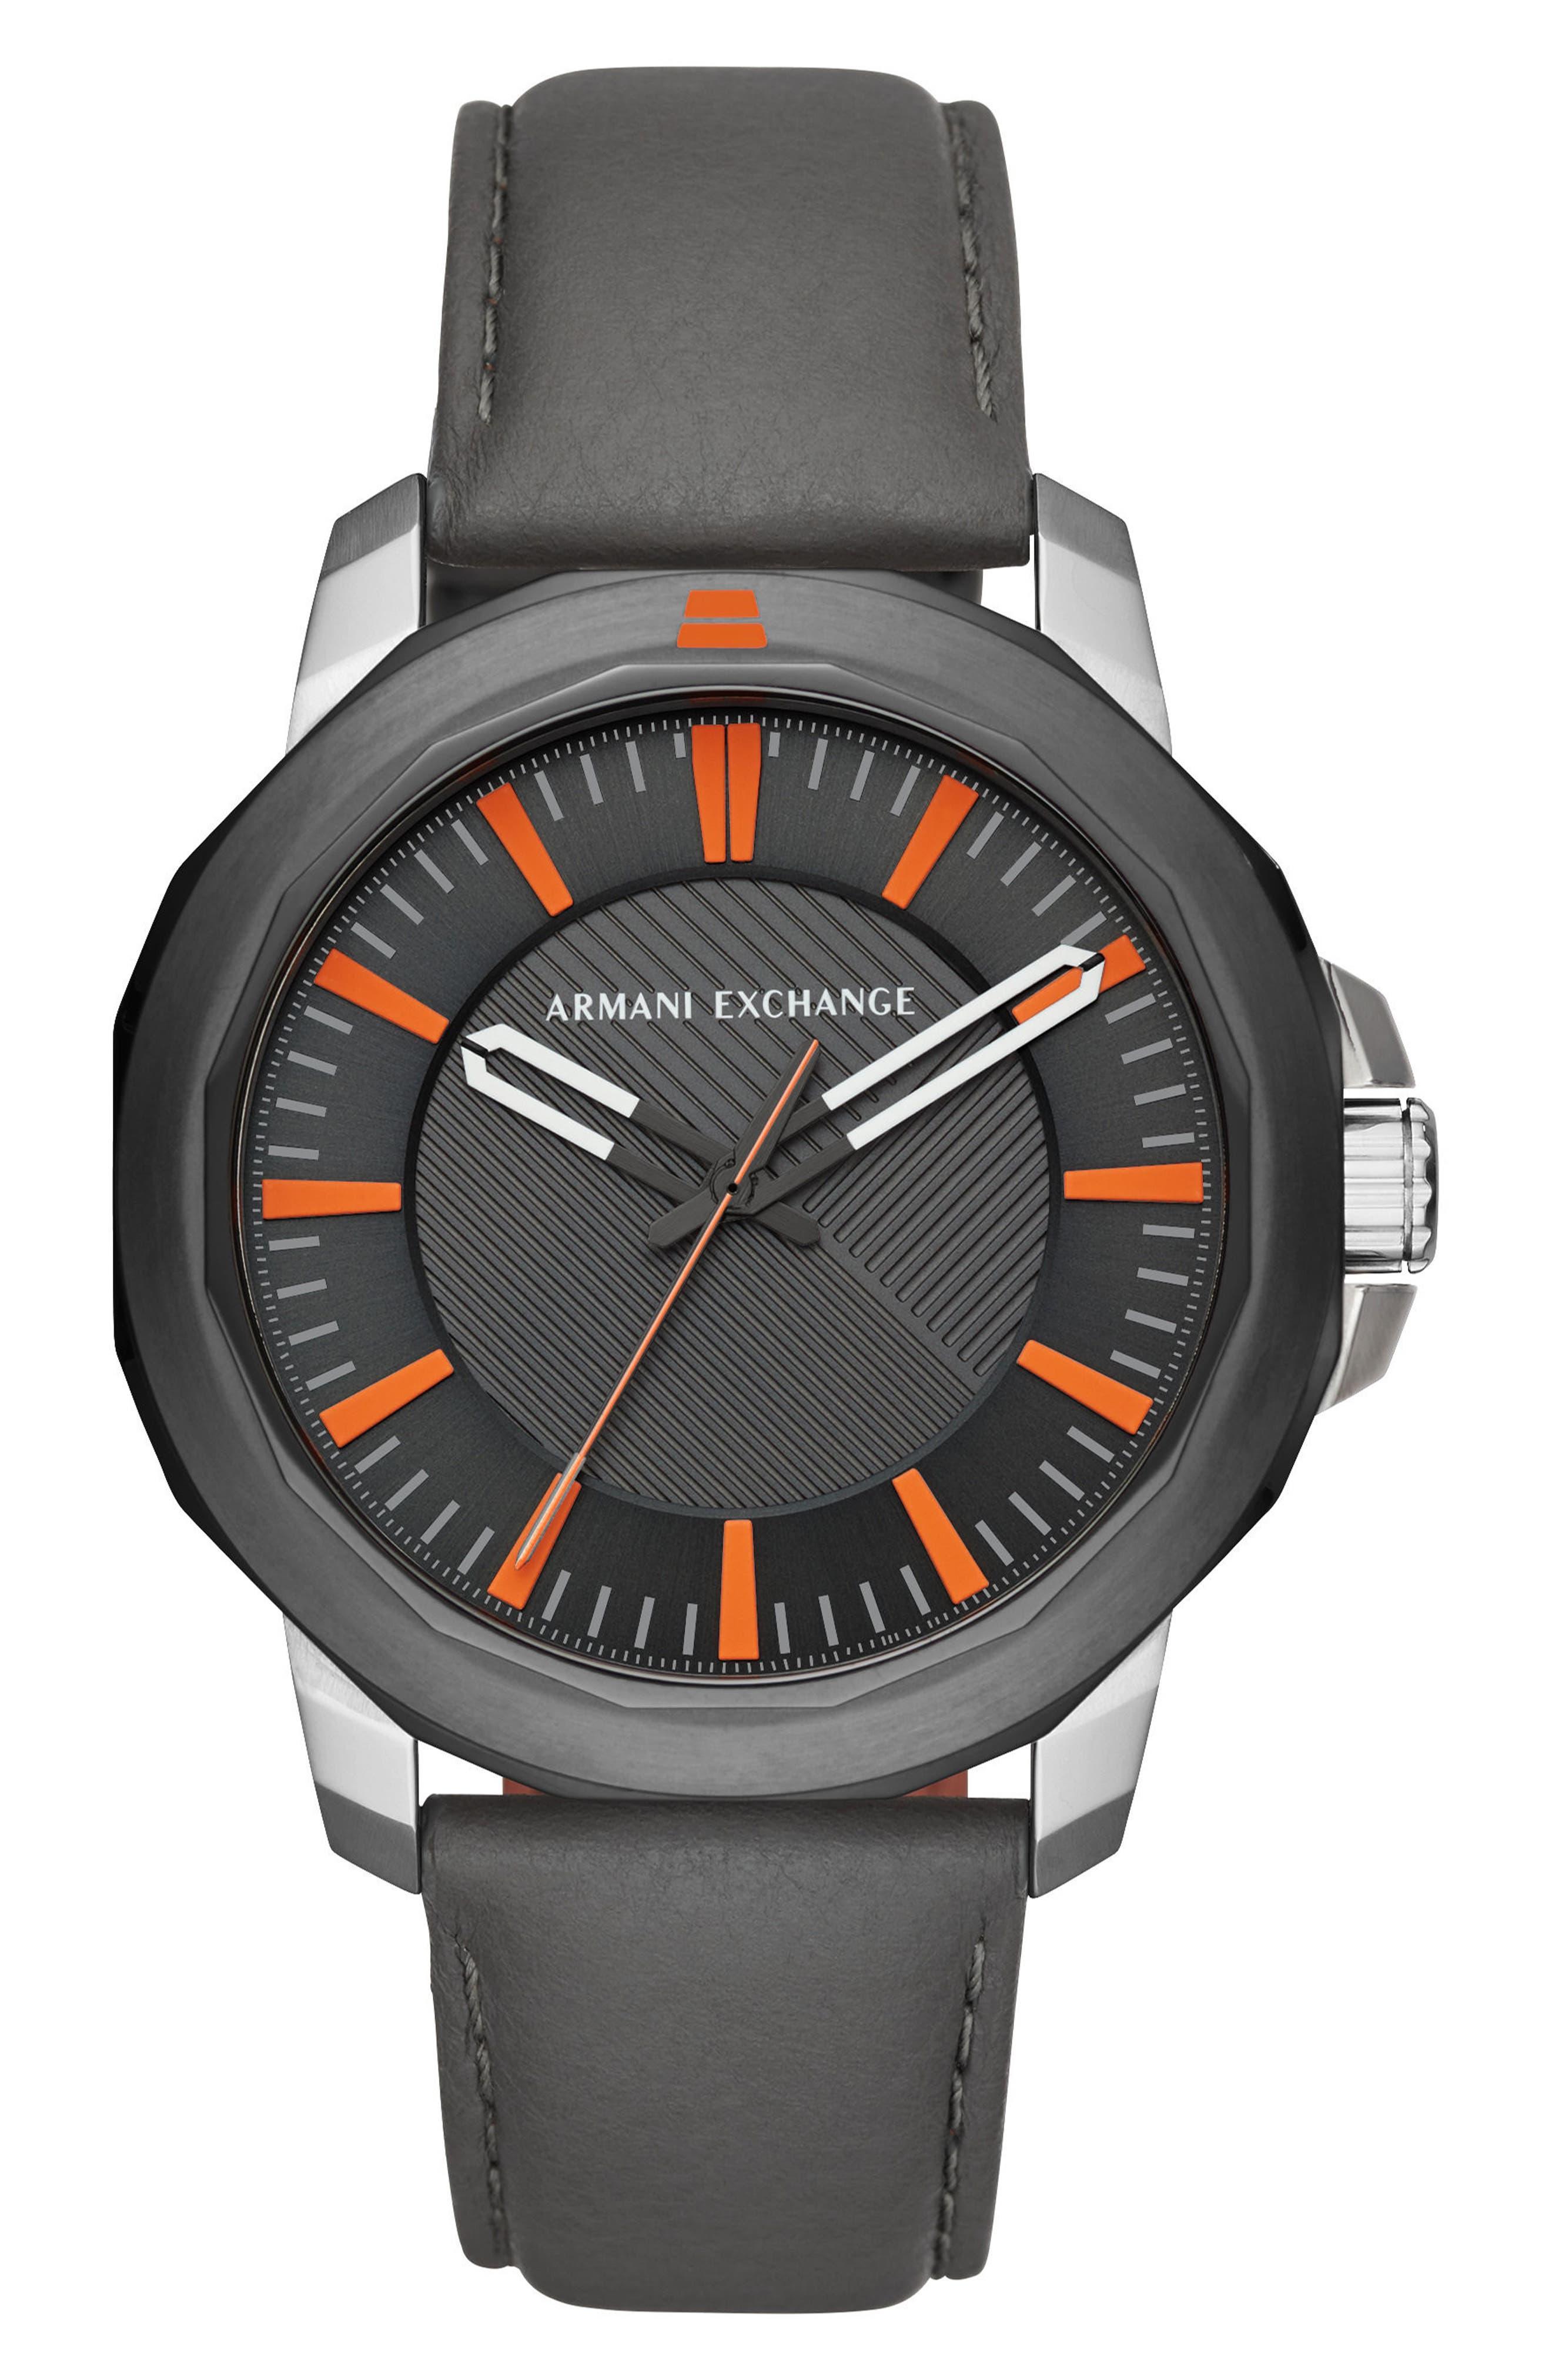 Main Image - AX Armani Exchange Three-Hand Leather Strap Watch, 44mm x 52mm